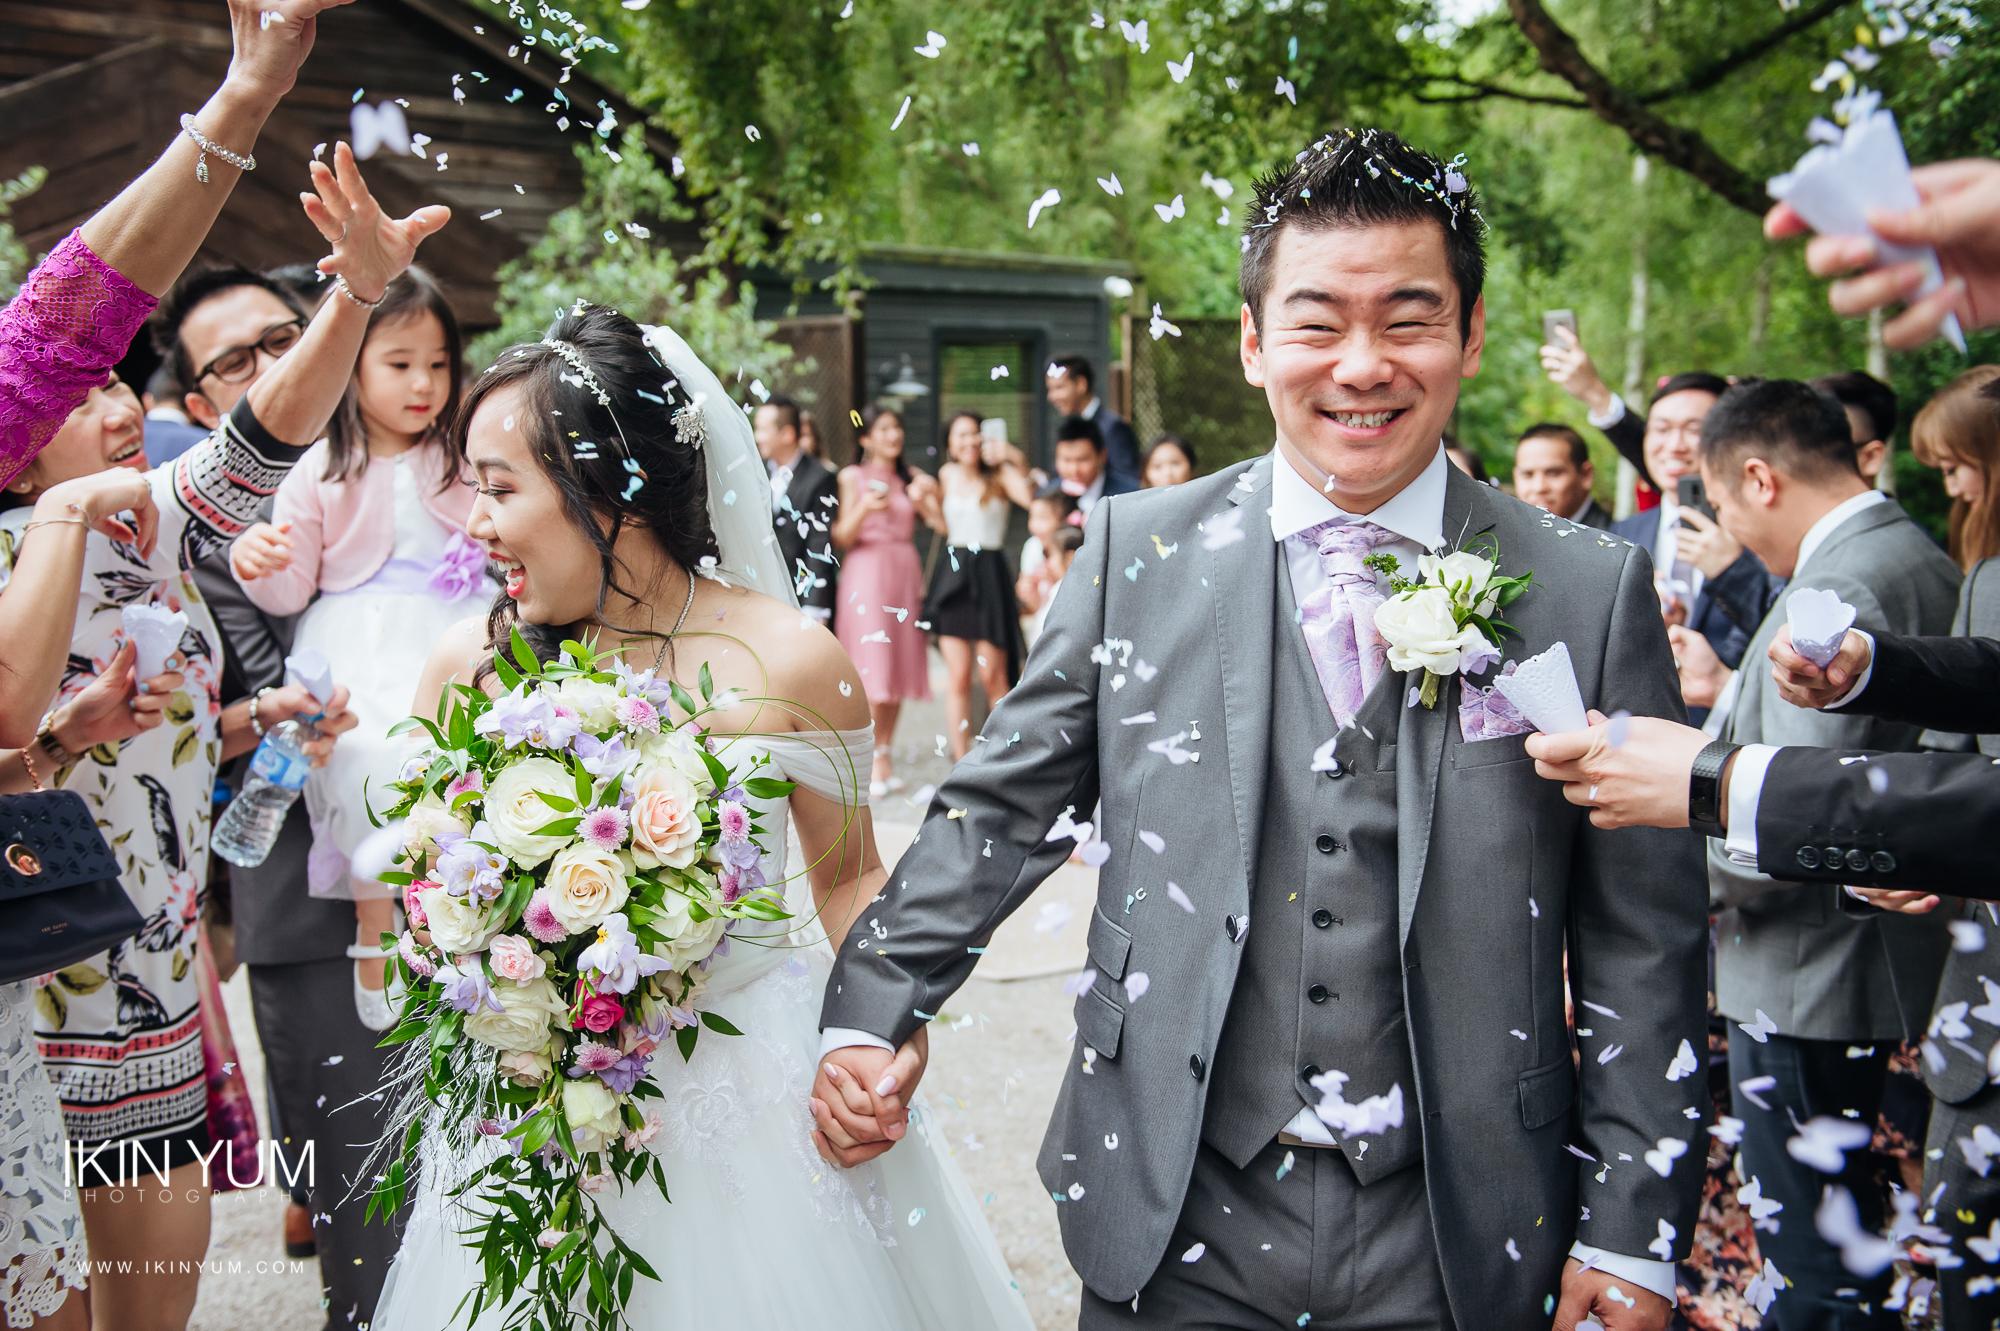 Hampton Manor Wedding - Ikin Yum Photography -095.jpg